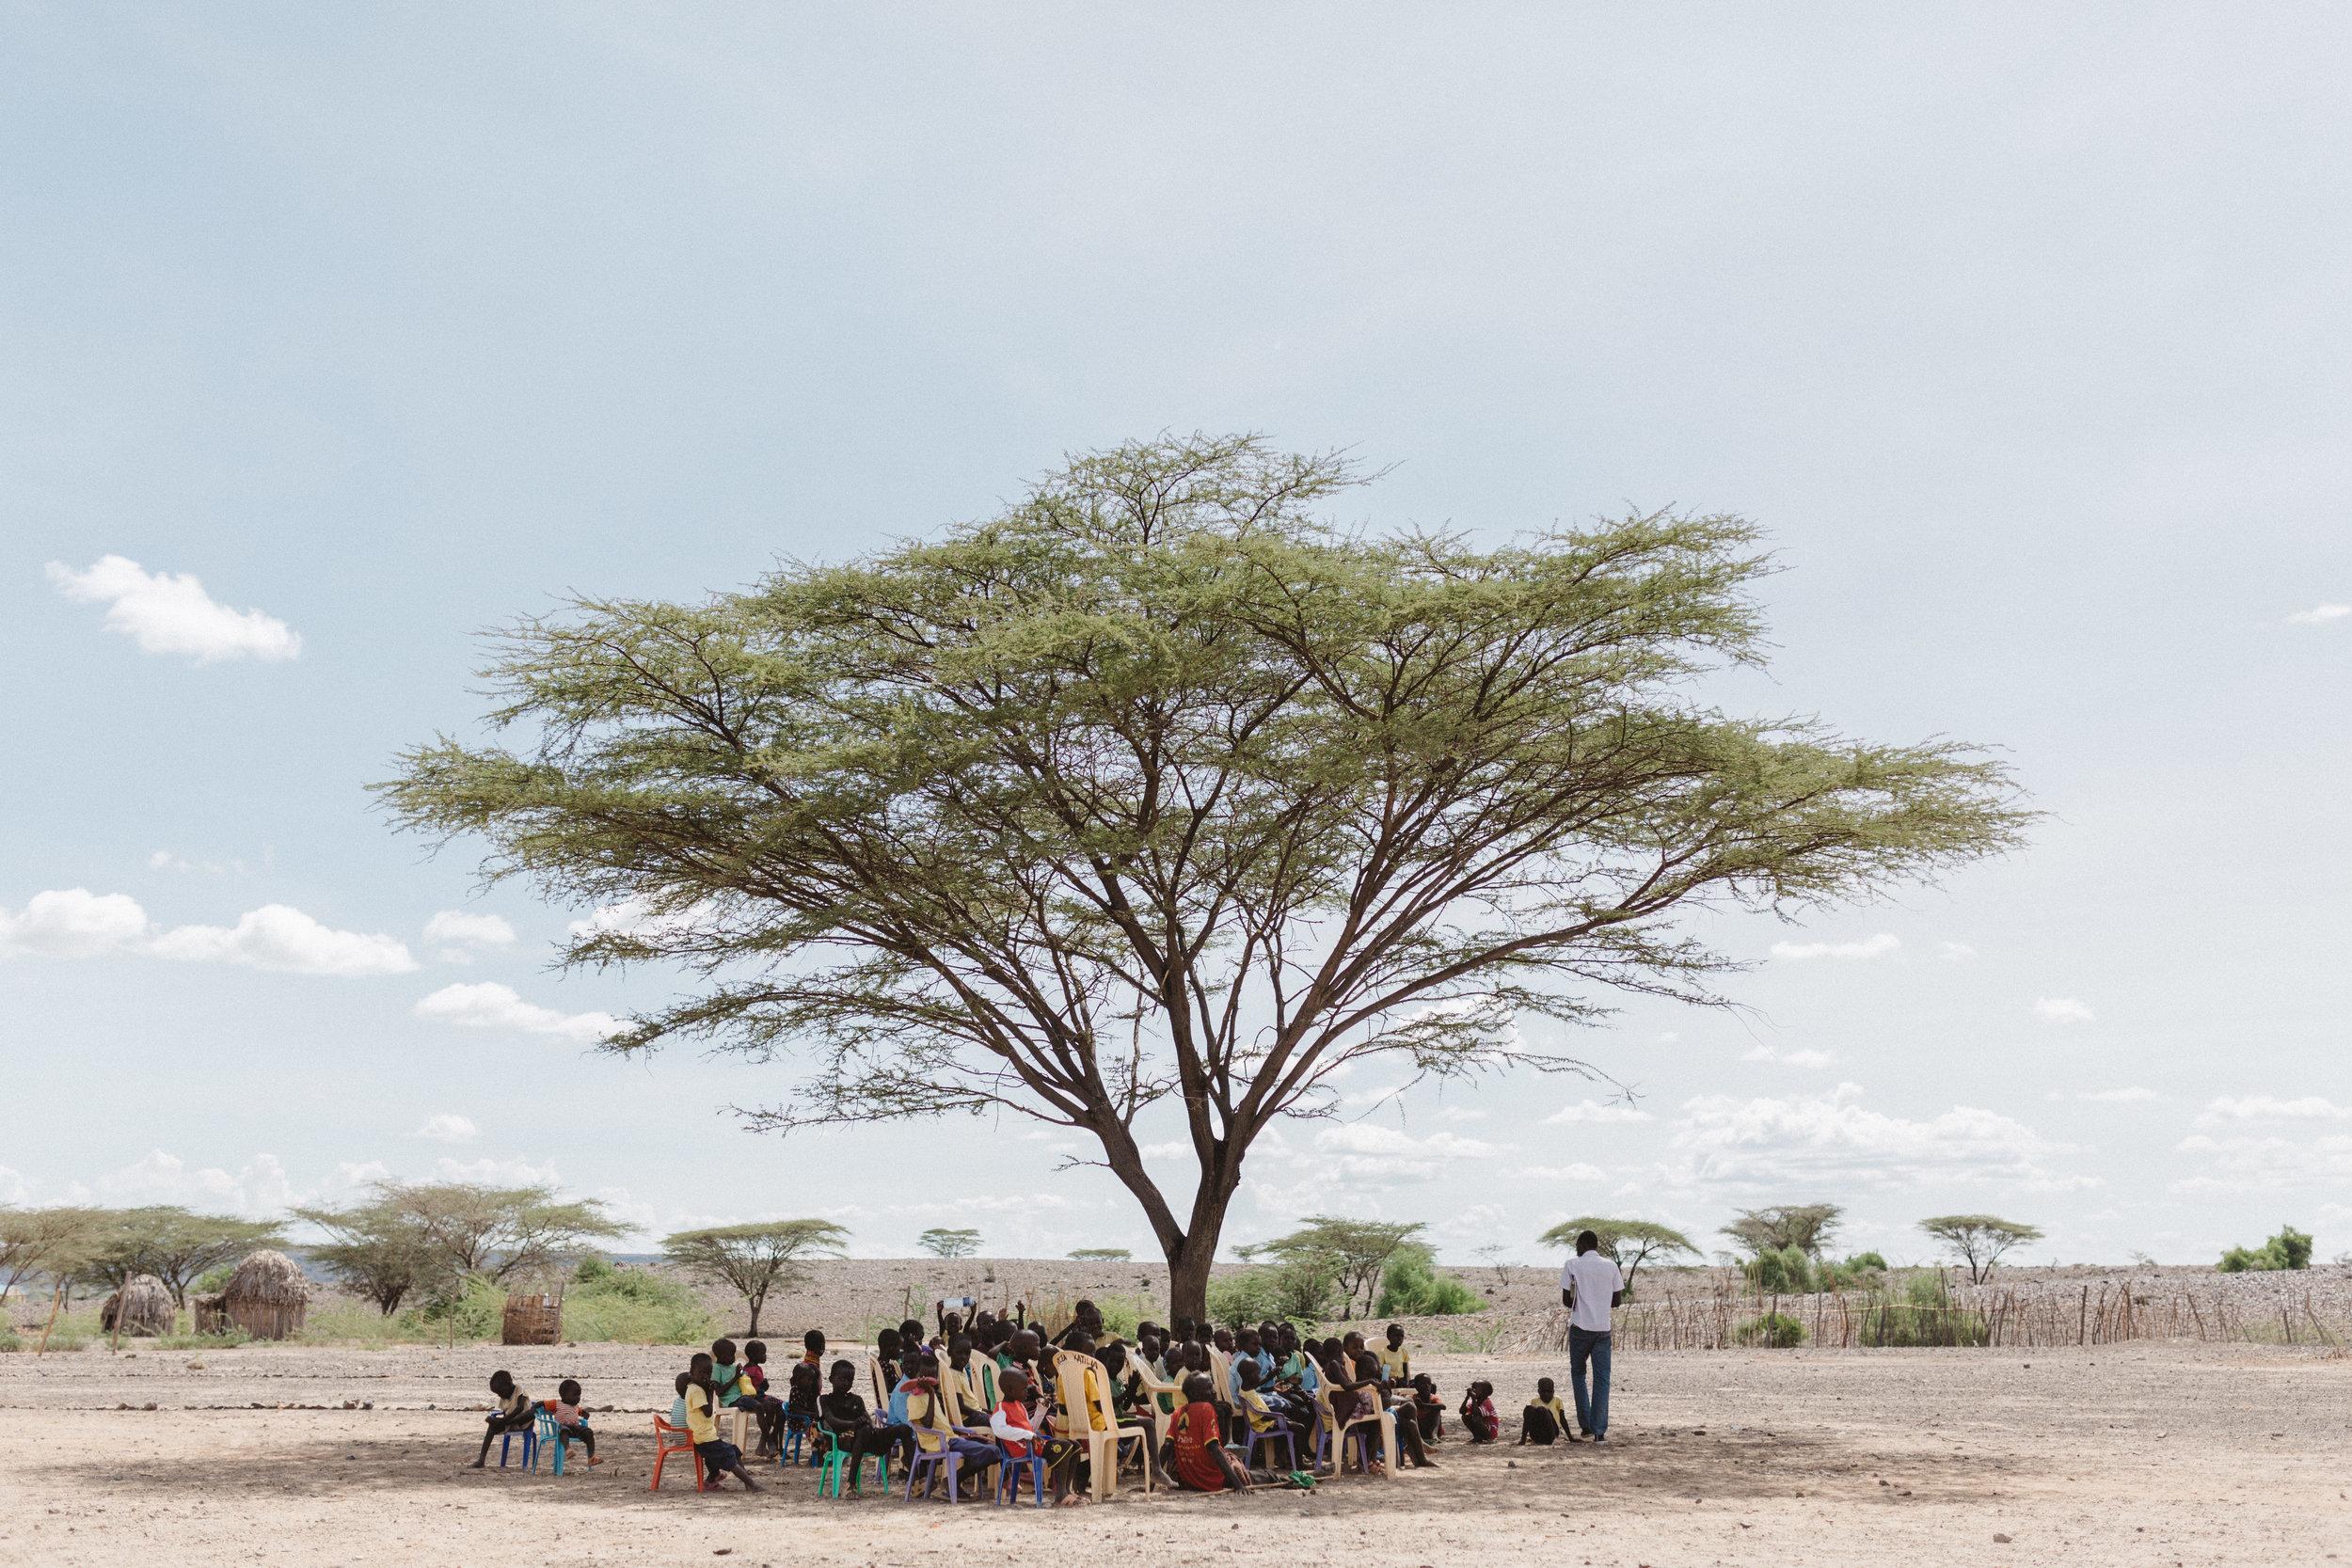 Shade is a precious resource in Turkana.